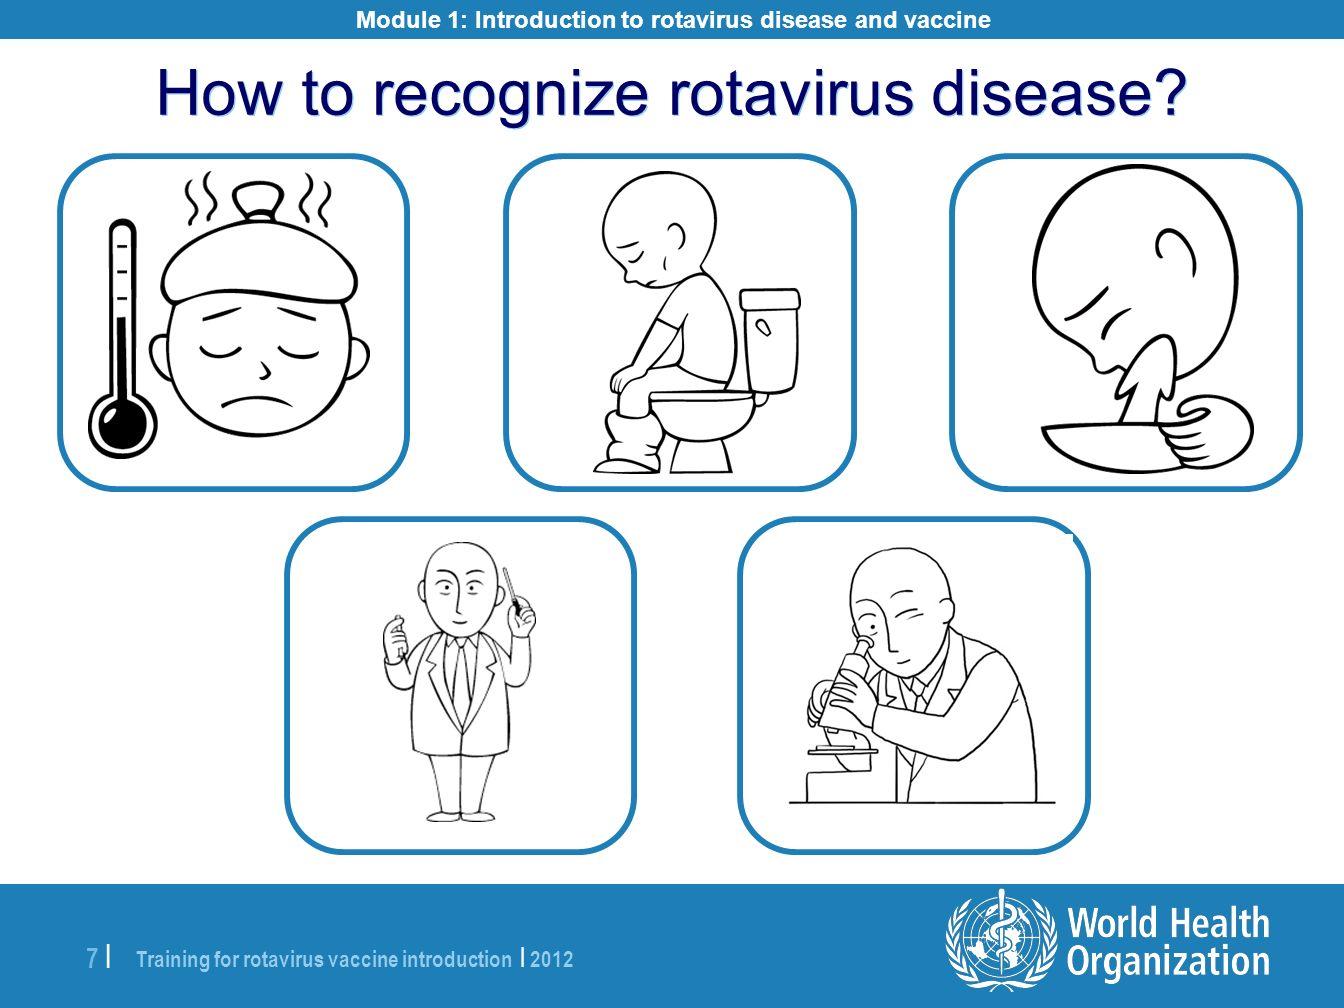 Training for rotavirus vaccine introduction | 2012 7 |7 | How to recognize rotavirus disease? Module 1: Introduction to rotavirus disease and vaccine